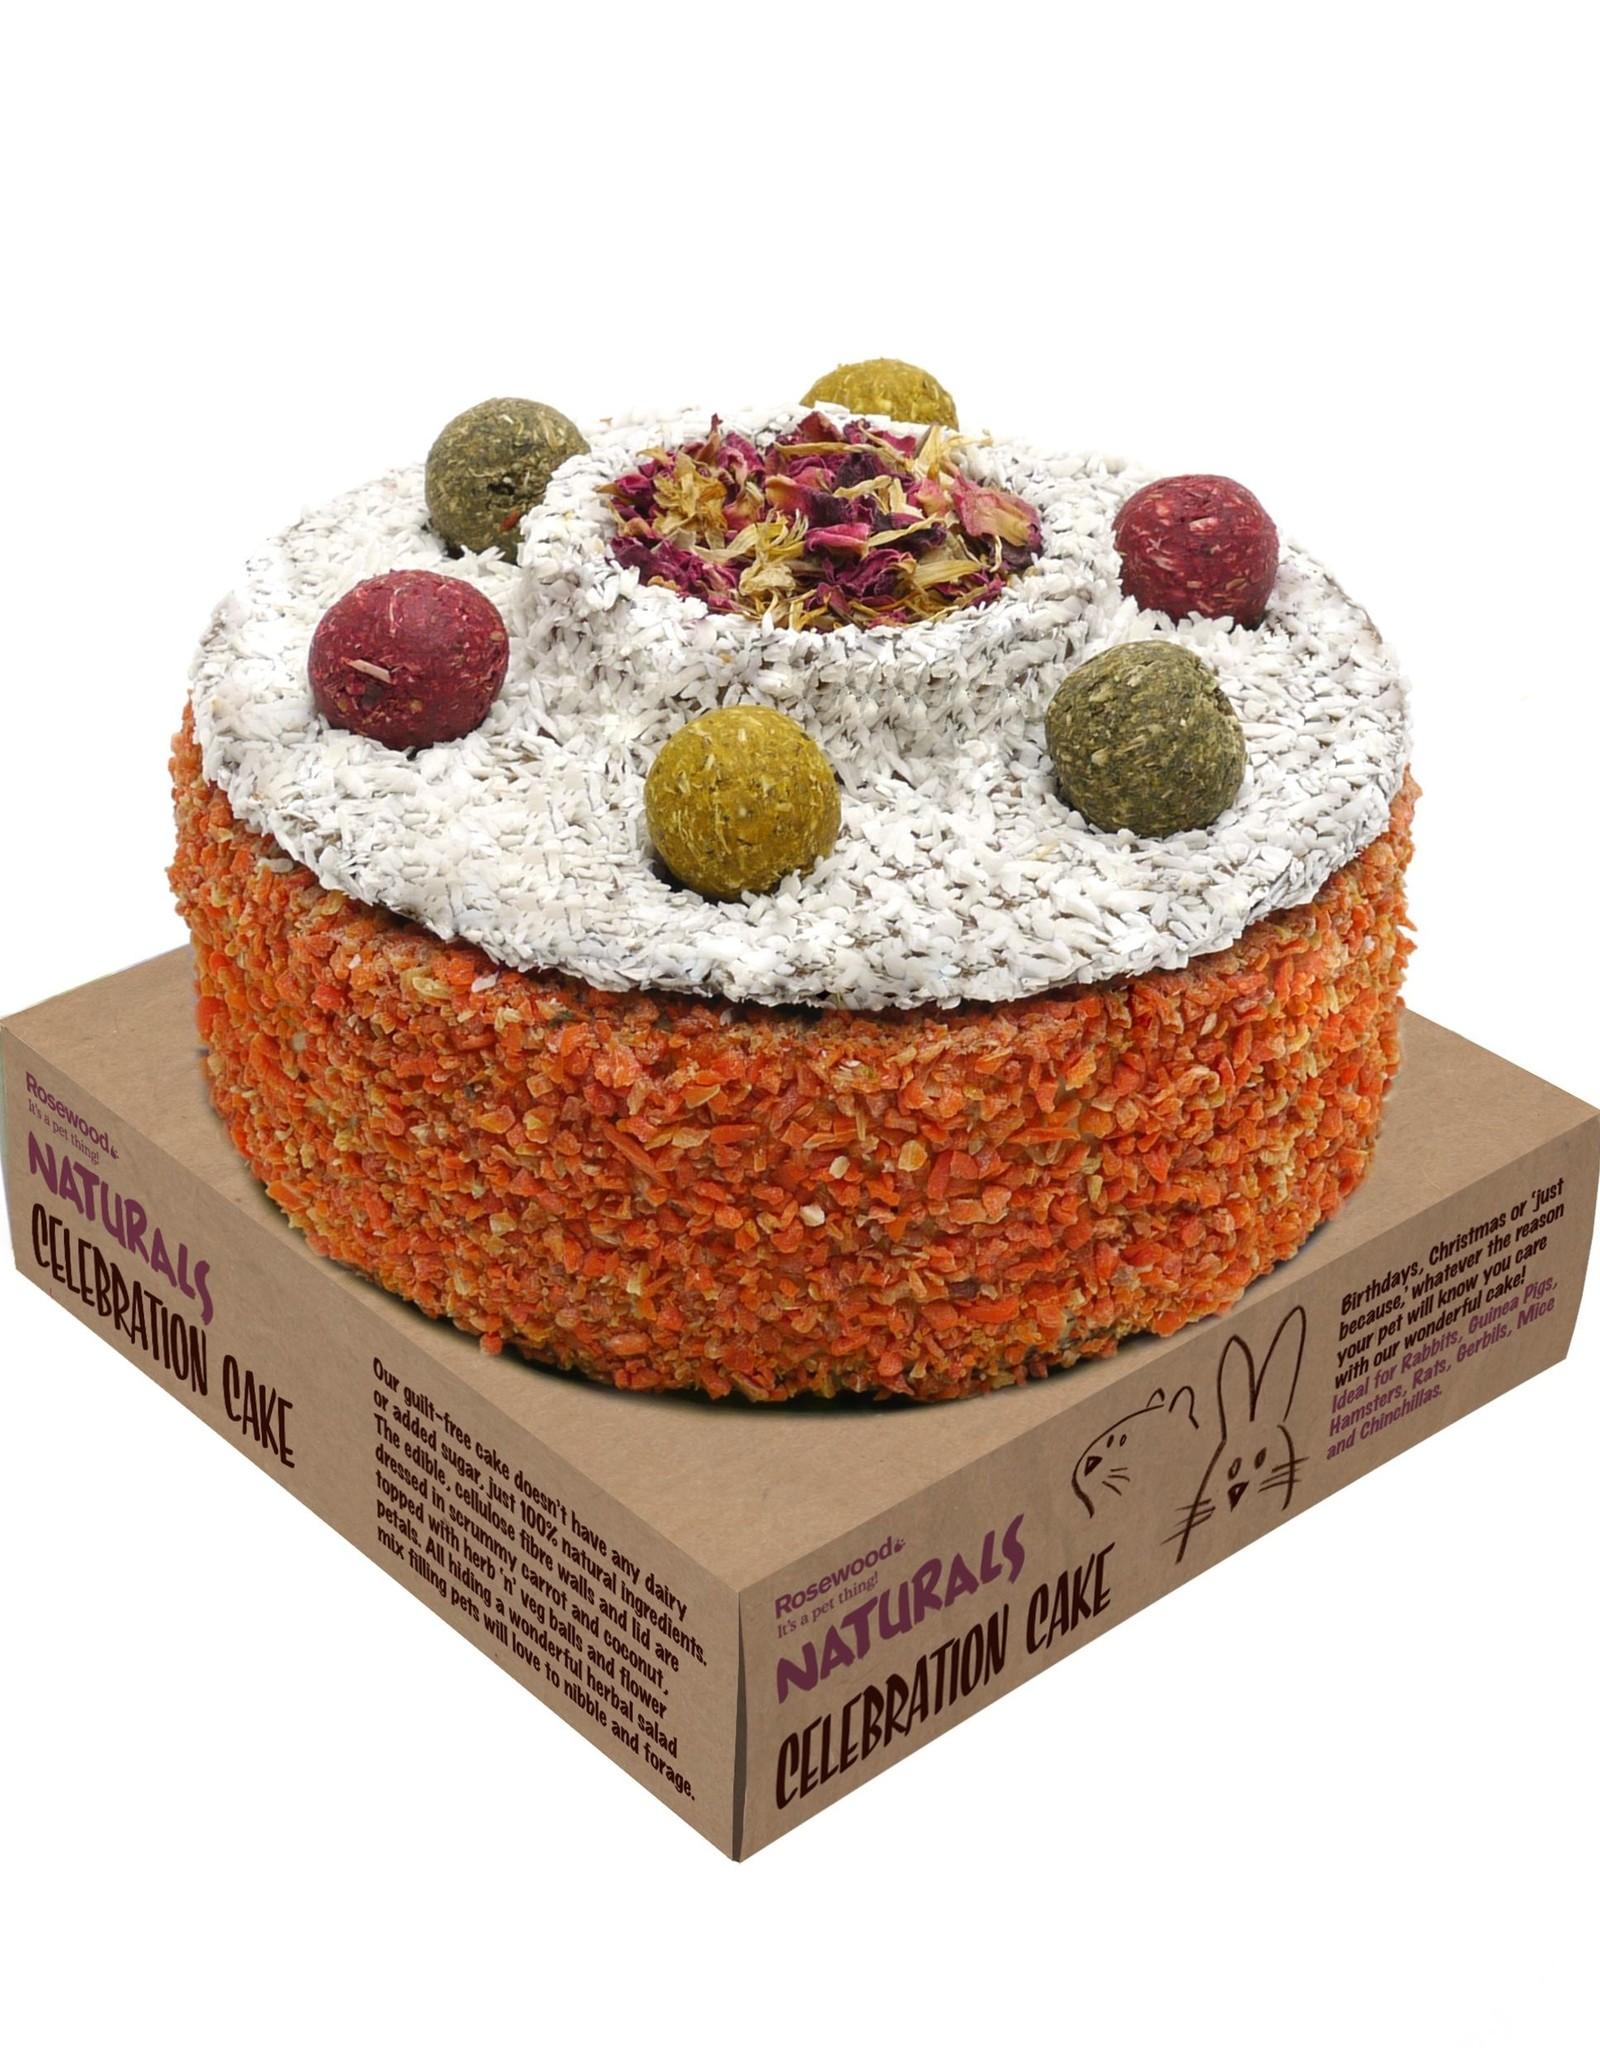 Rosewood Naturals: Celebration Cake